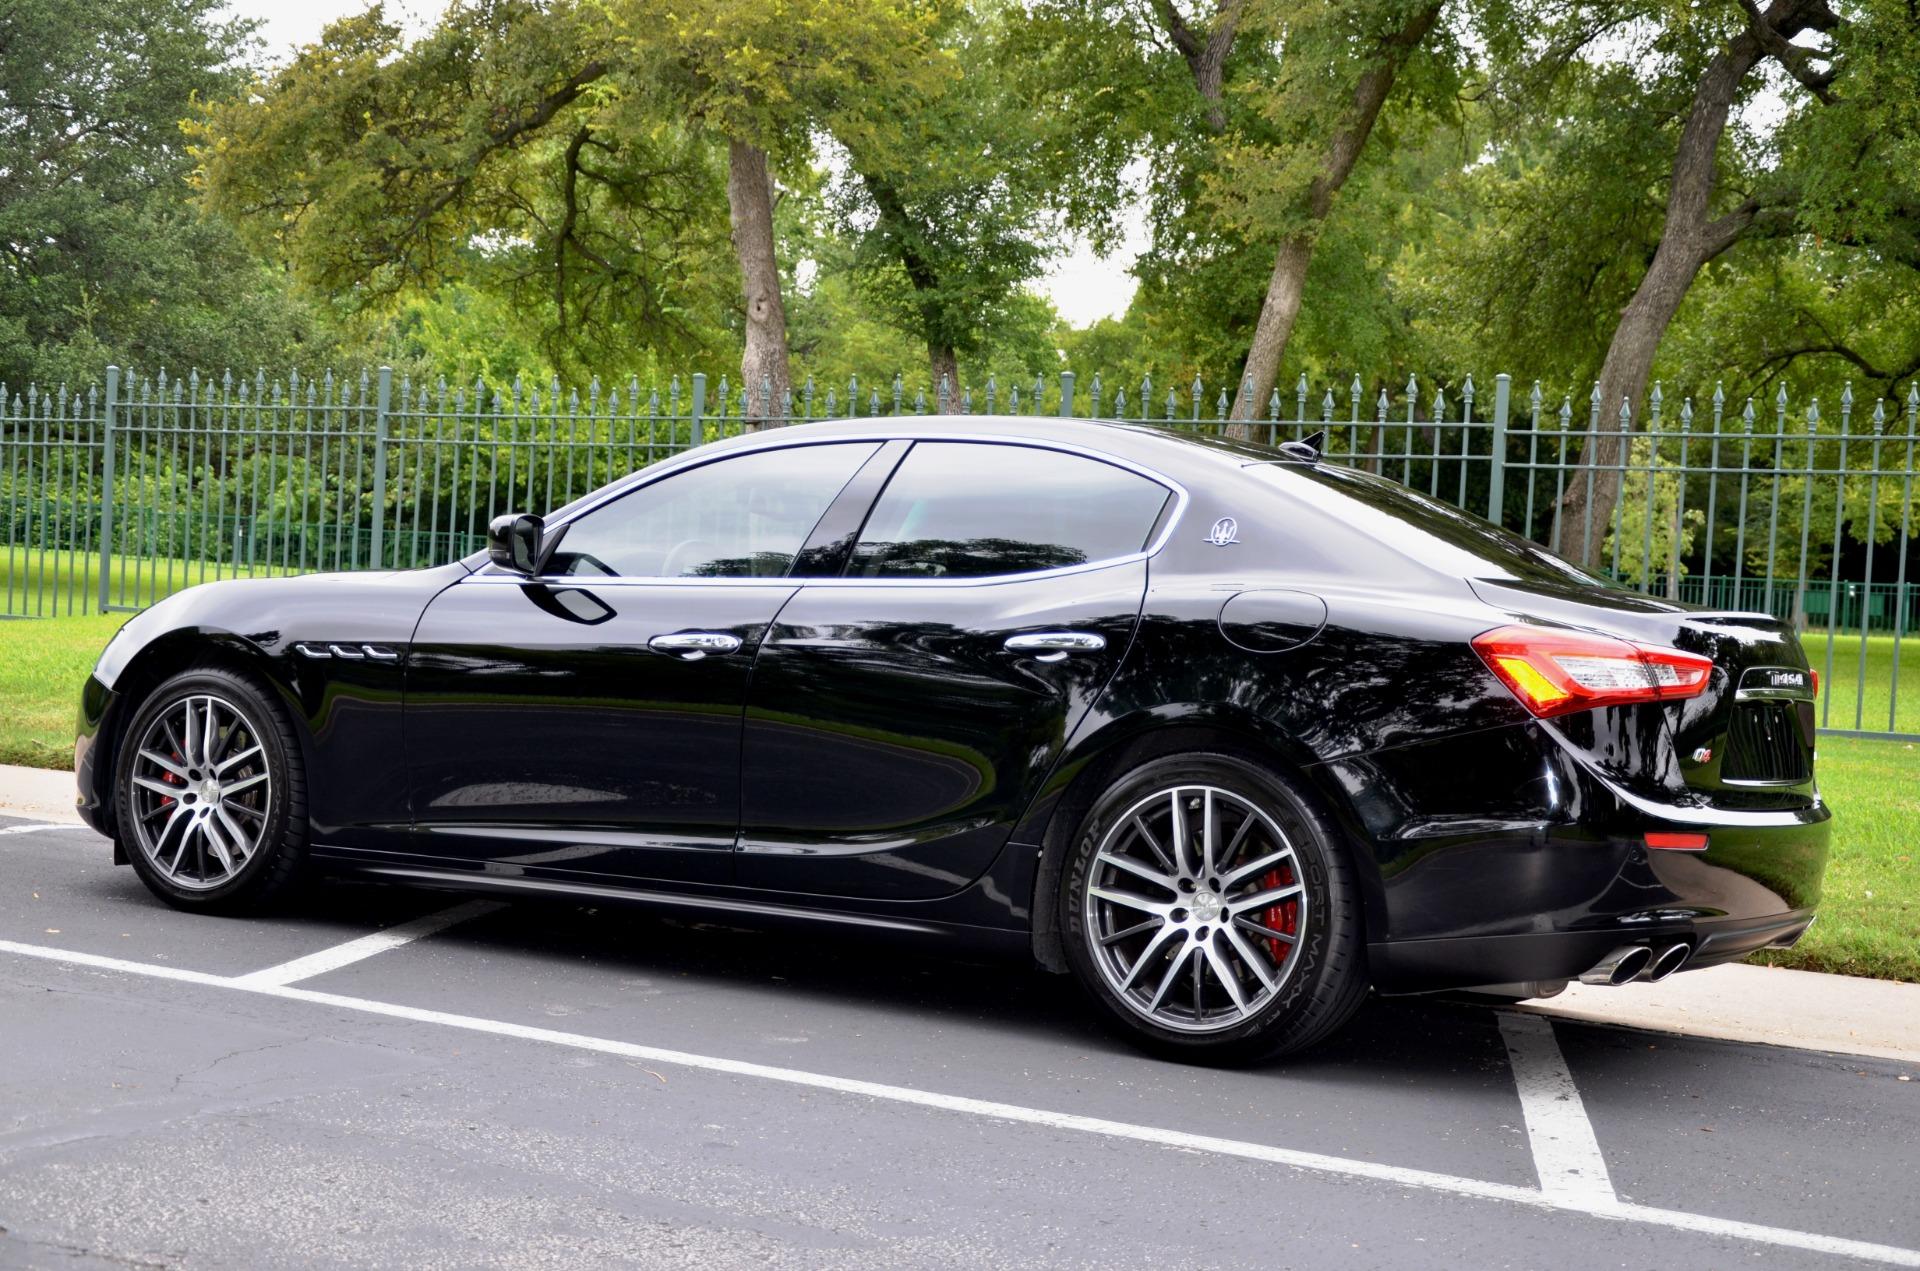 Maserati Q4 Price >> 2014 Maserati Ghibli S Q4 Stock # 14MASGHIB for sale near ...